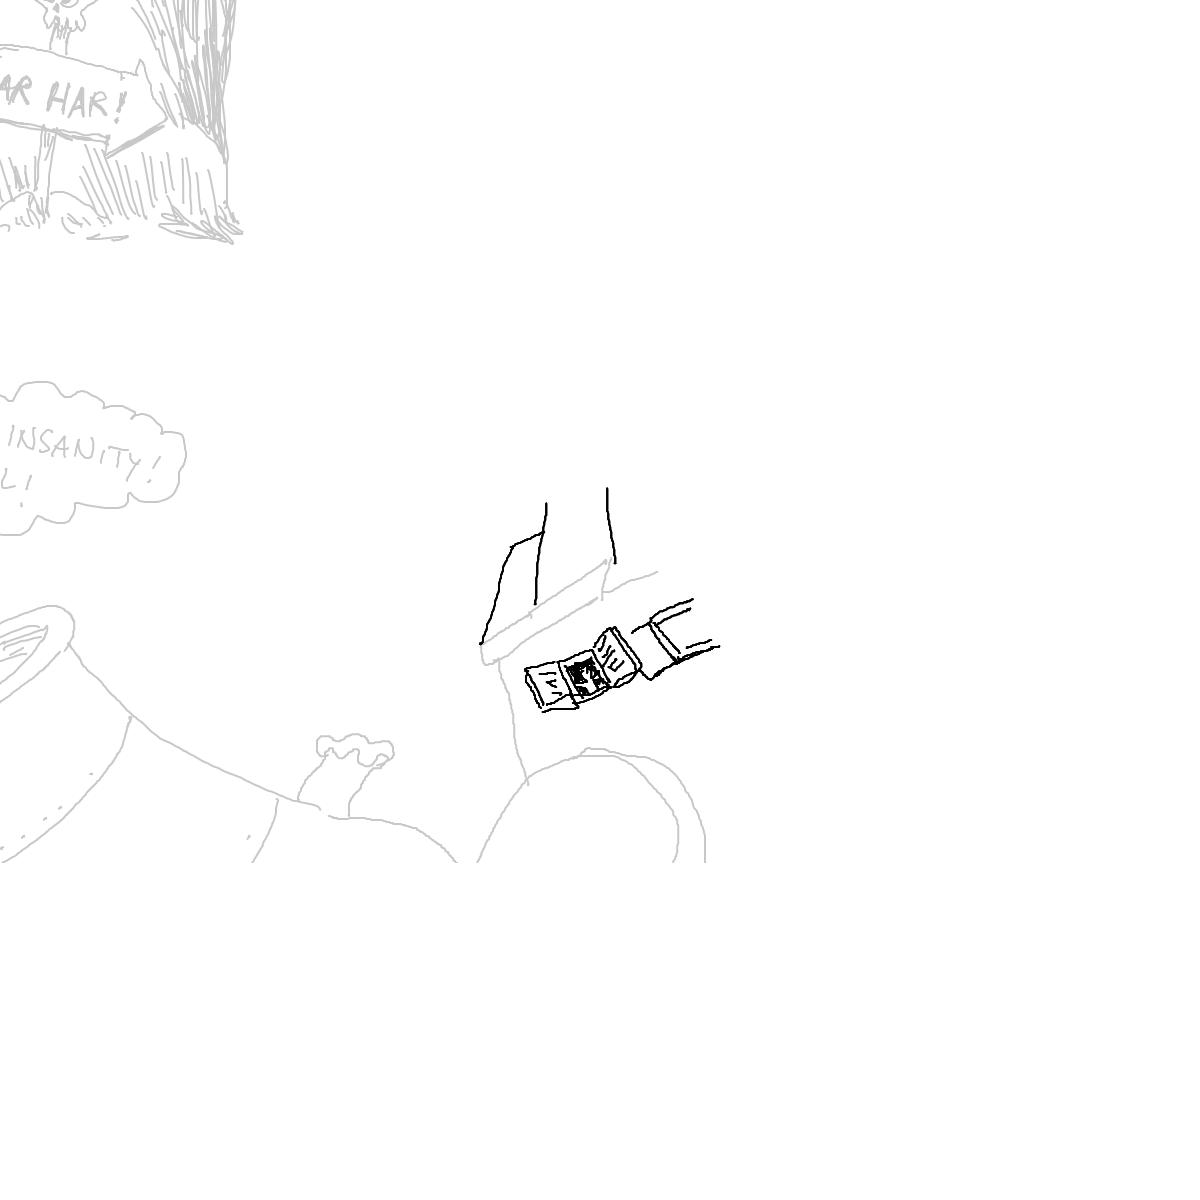 BAAAM drawing#22106 lat:78.4192276000976600lng: -4.4738907814025880